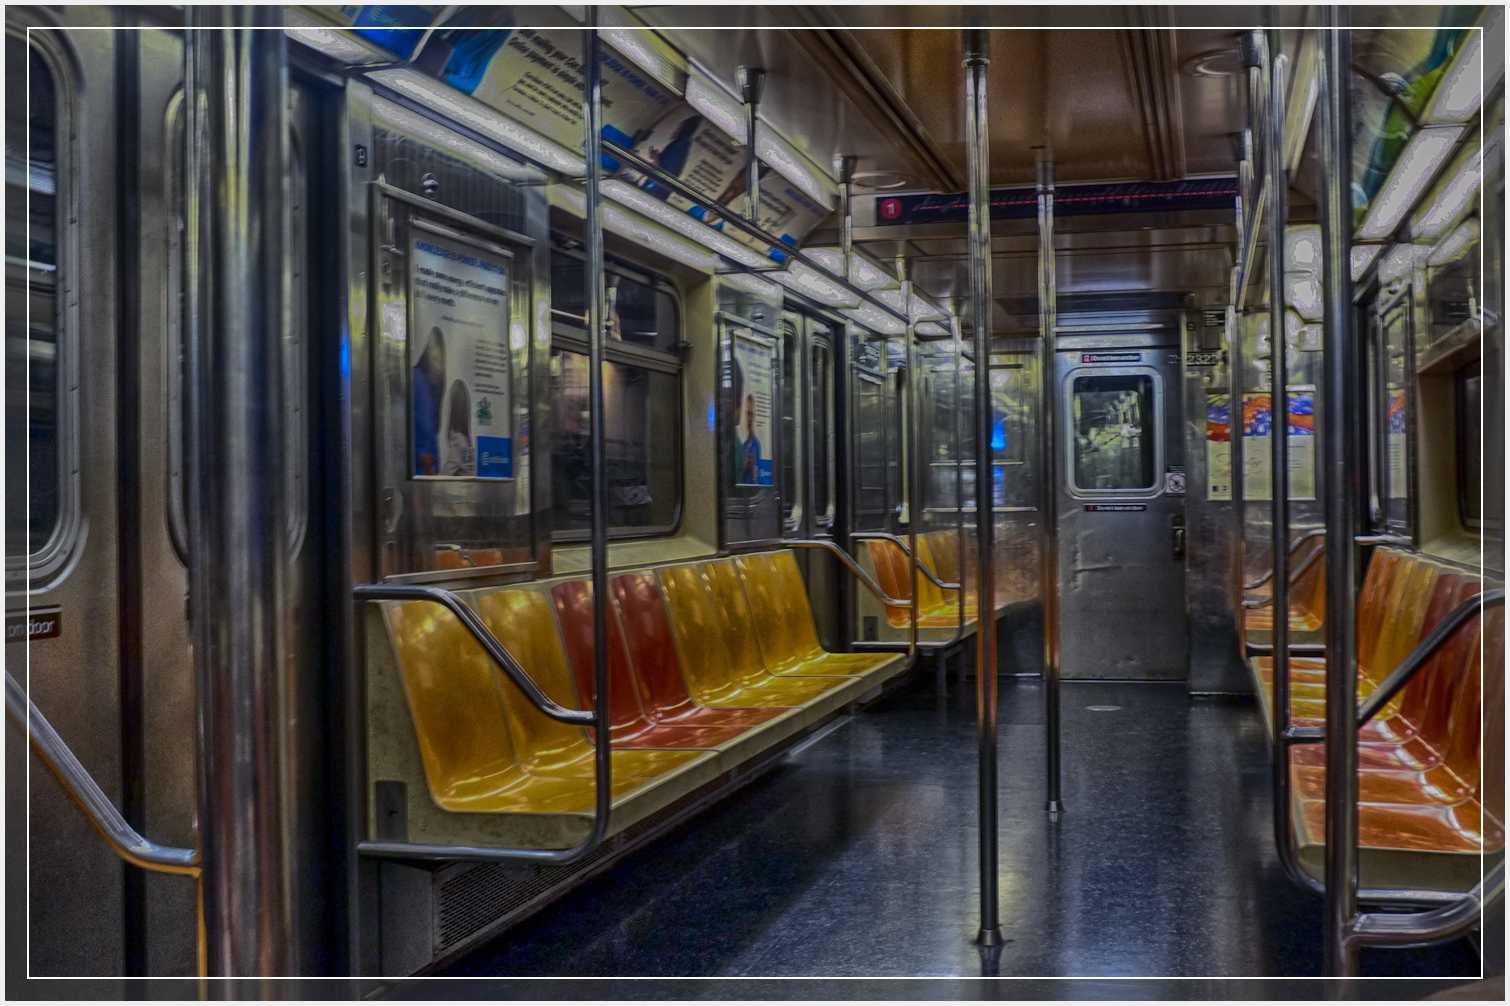 New York - Suway